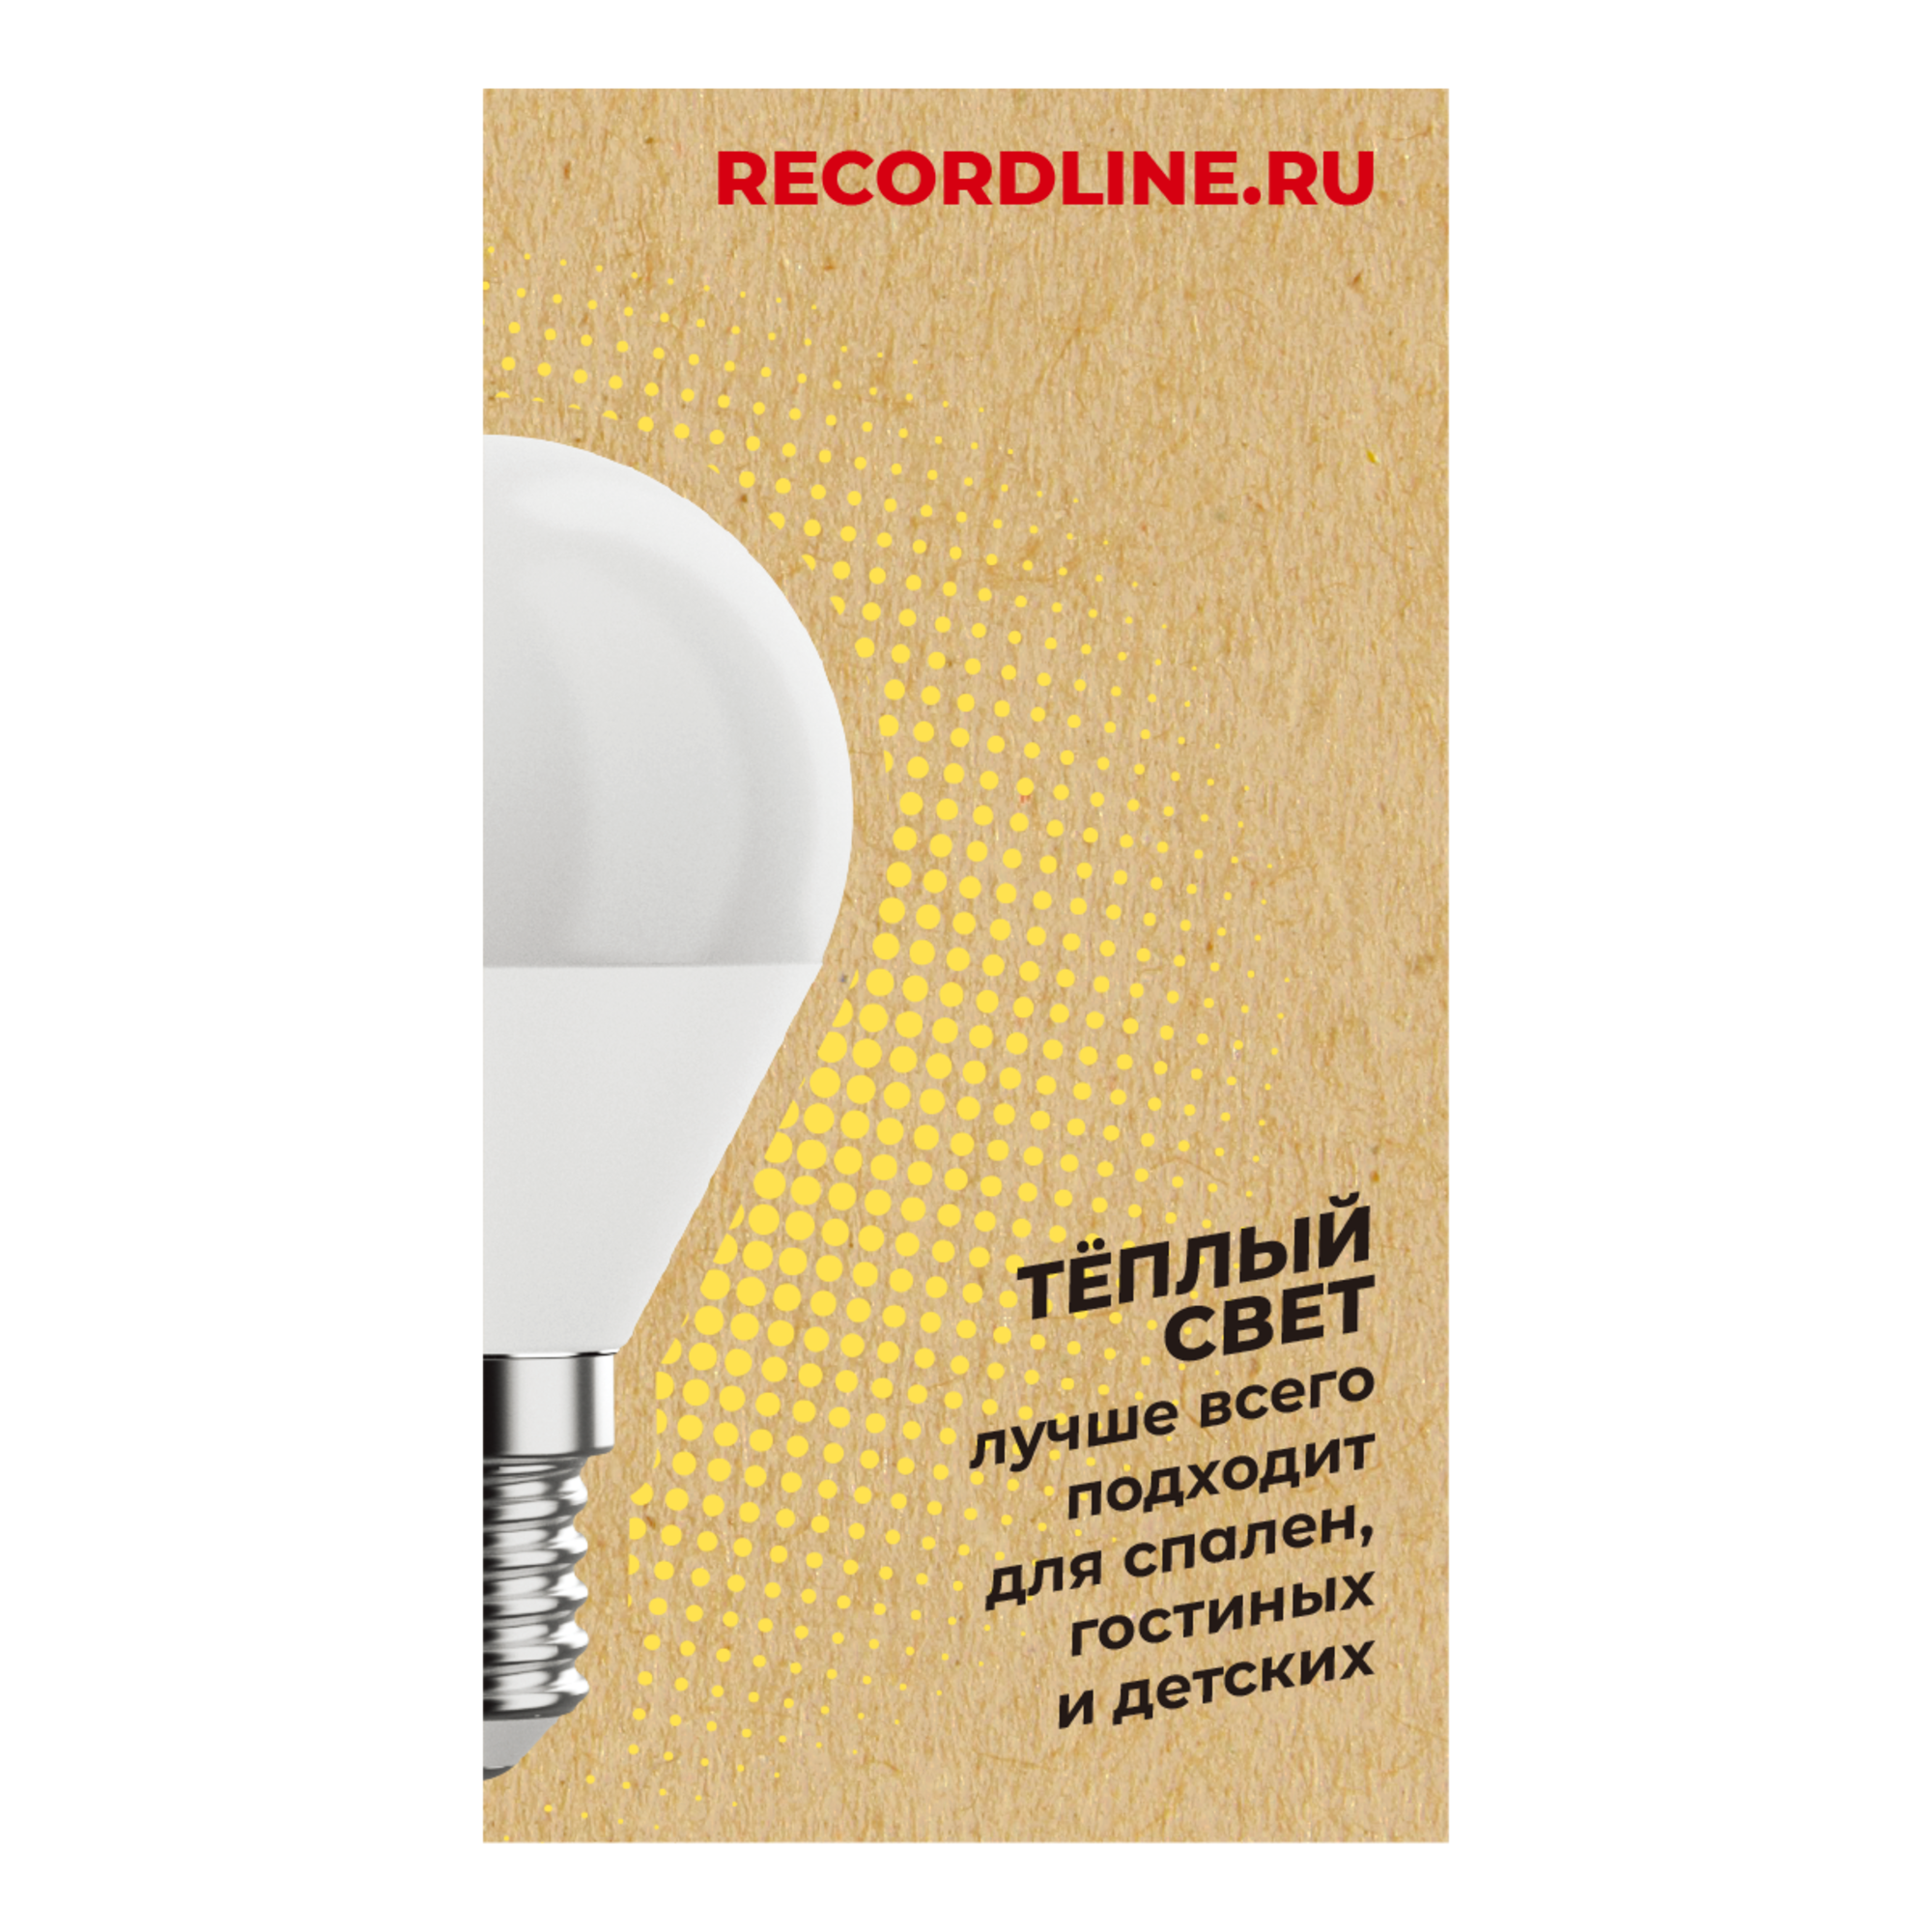 Светодиодная лампочка Рекорд 23883 E14 70 Лм 7 Вт